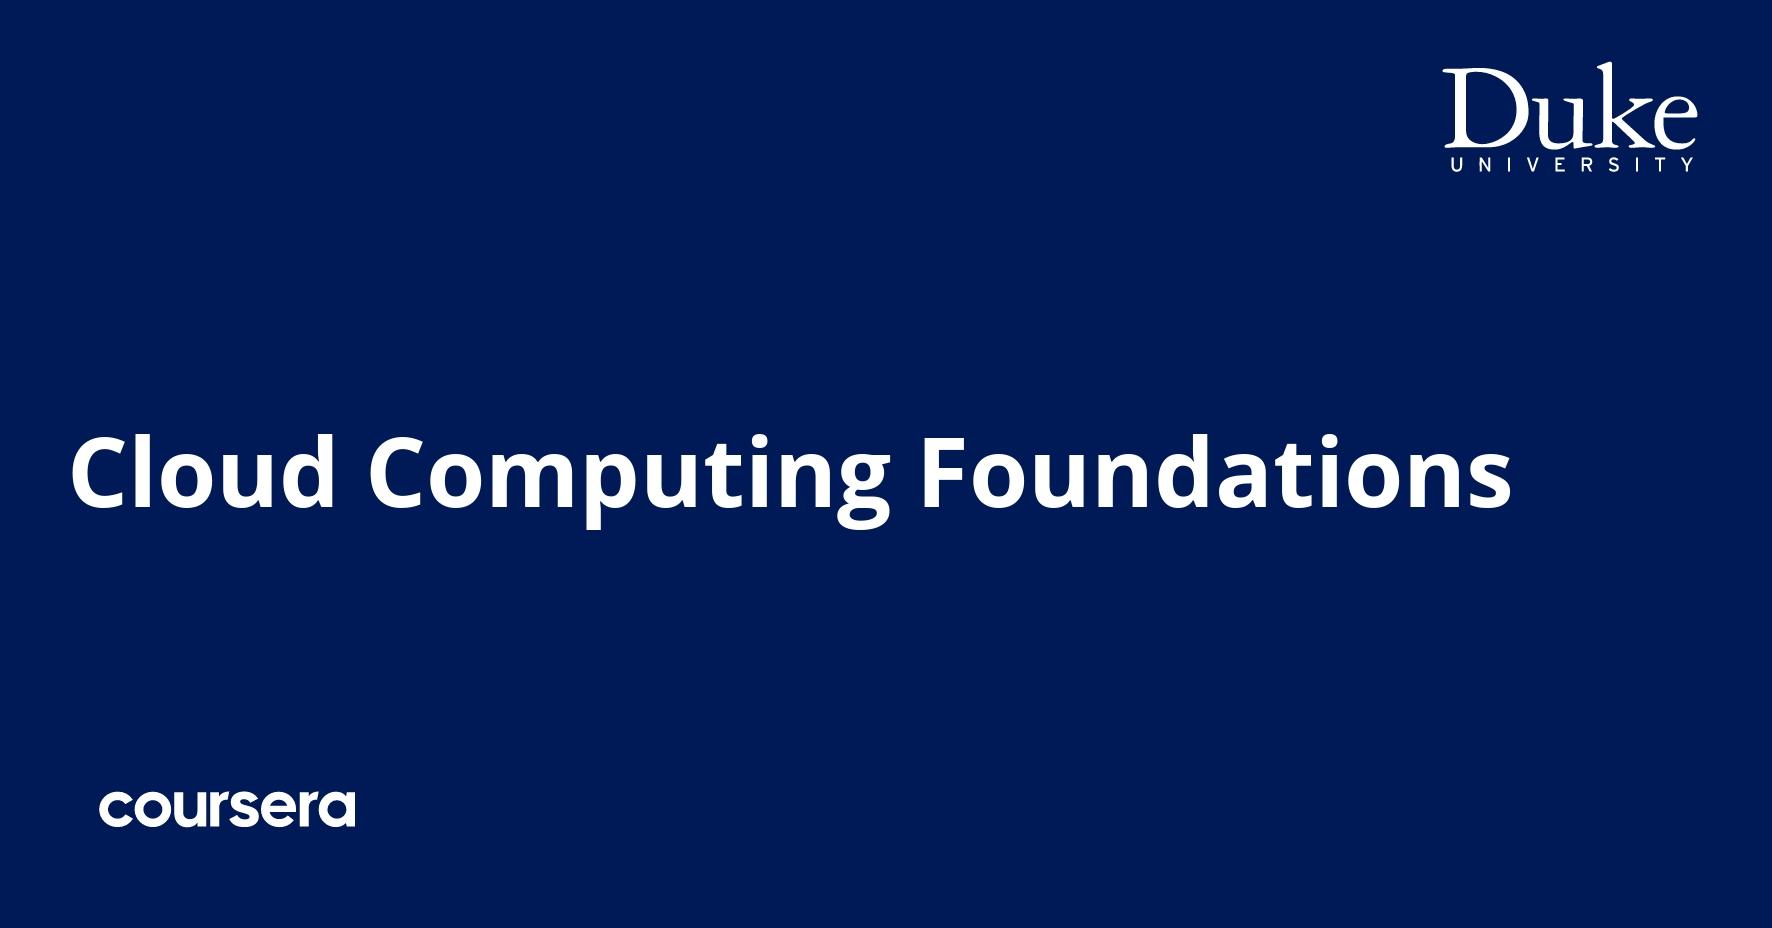 Cloud Computing Foundations